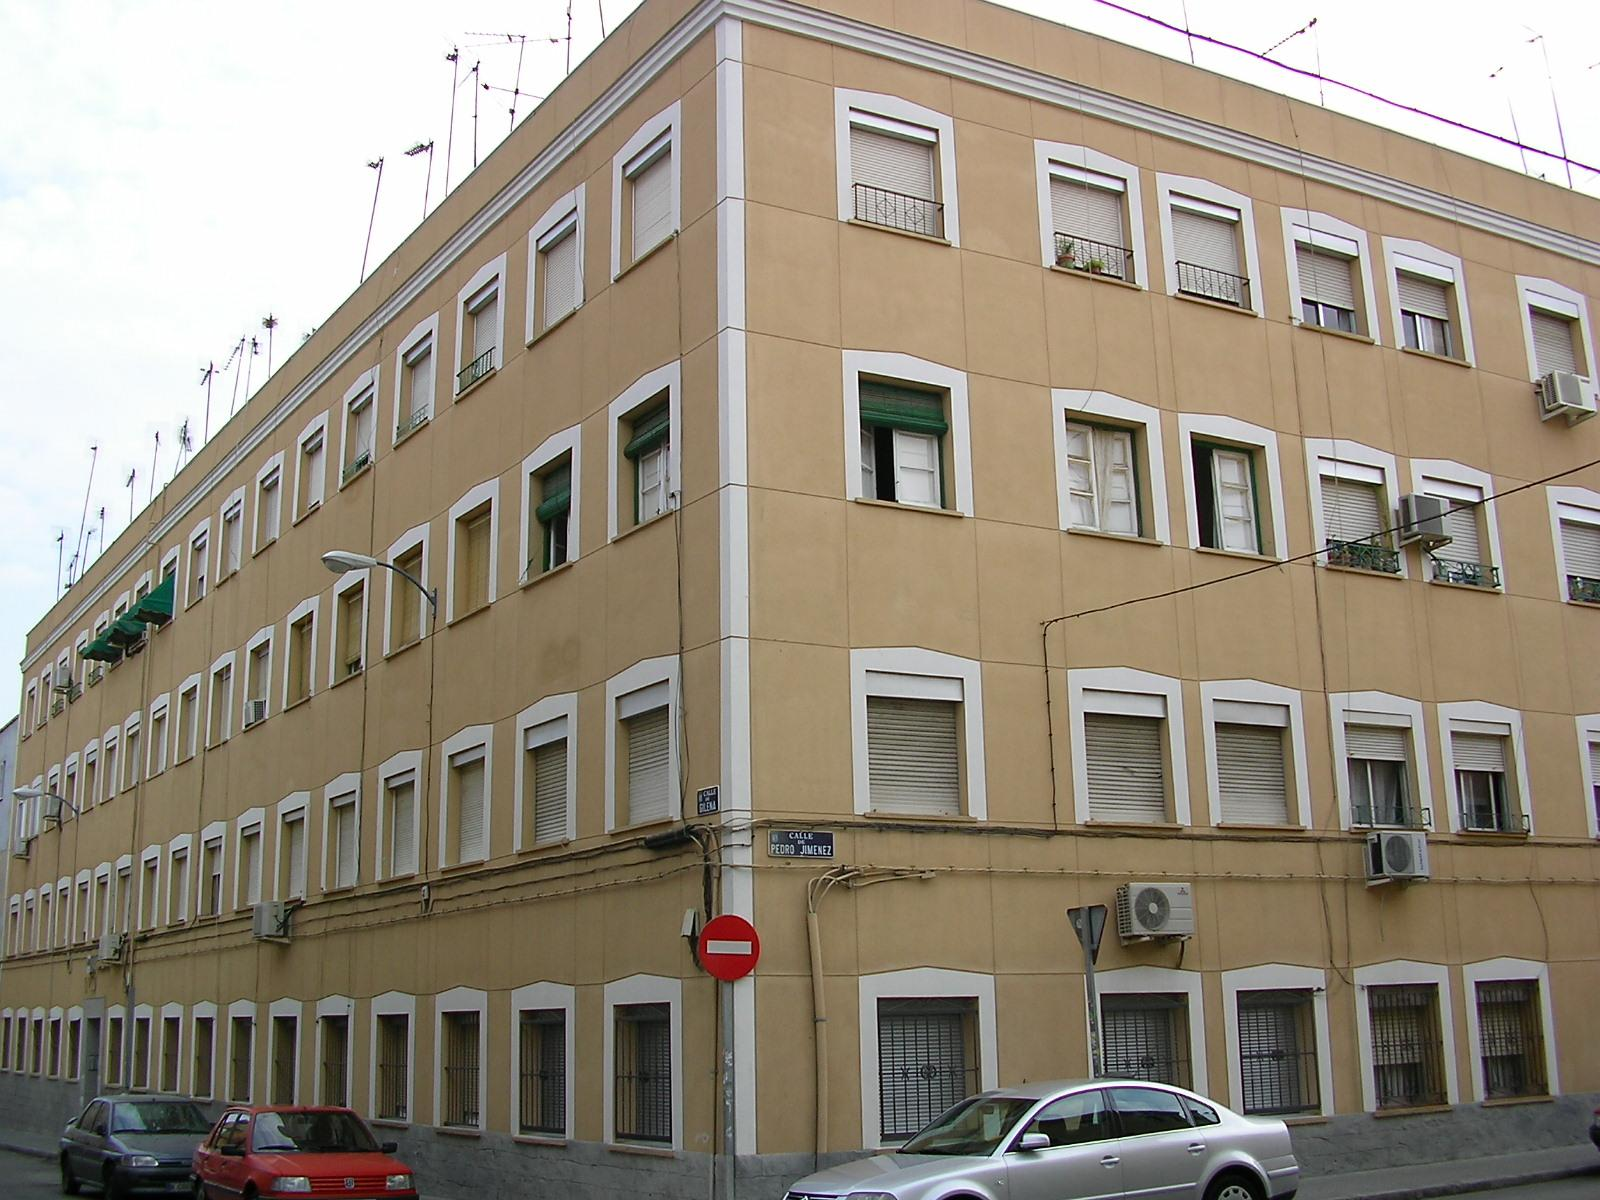 Rehabilitaci n de edificios en getafe diferentes tipos de - Mortero monocapa colores ...